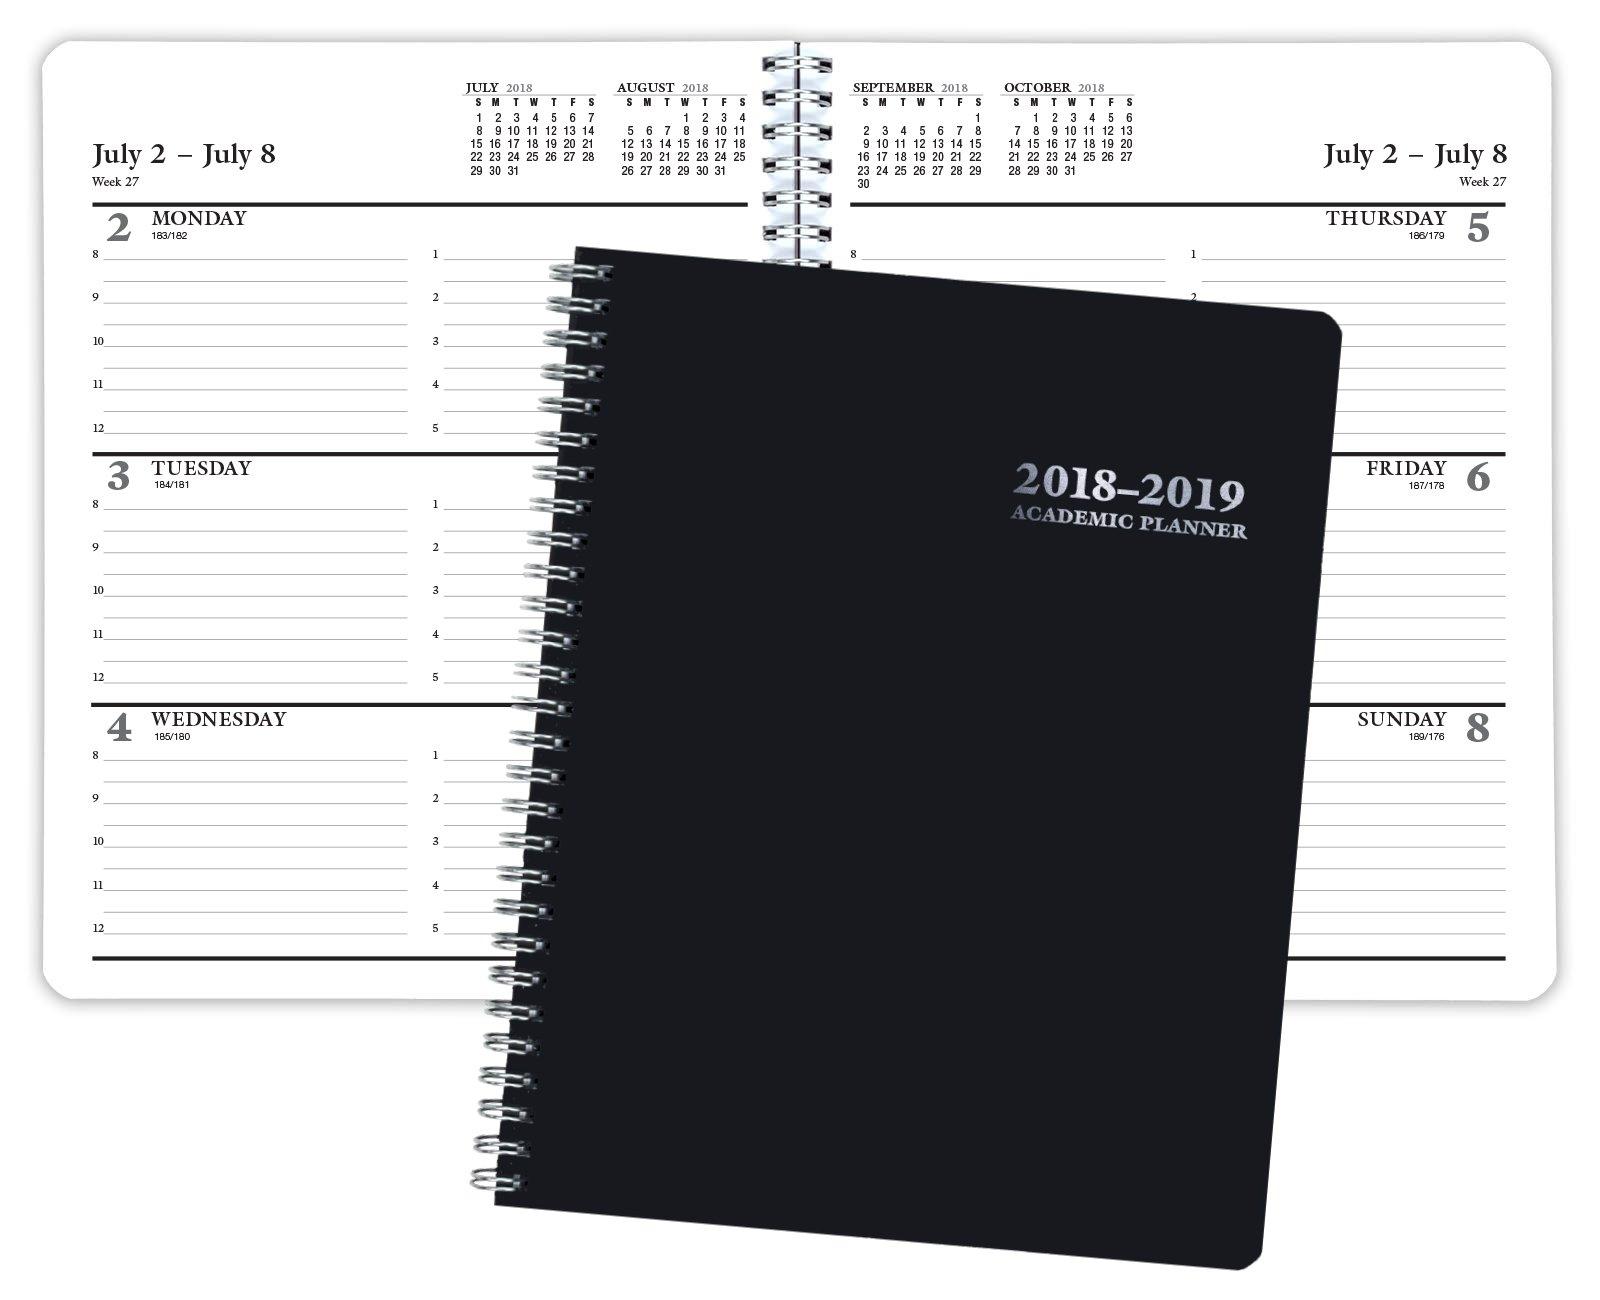 Premium Planner 2018-2019 Academic Year Planner - 8x10 - July 2018 through July 2019